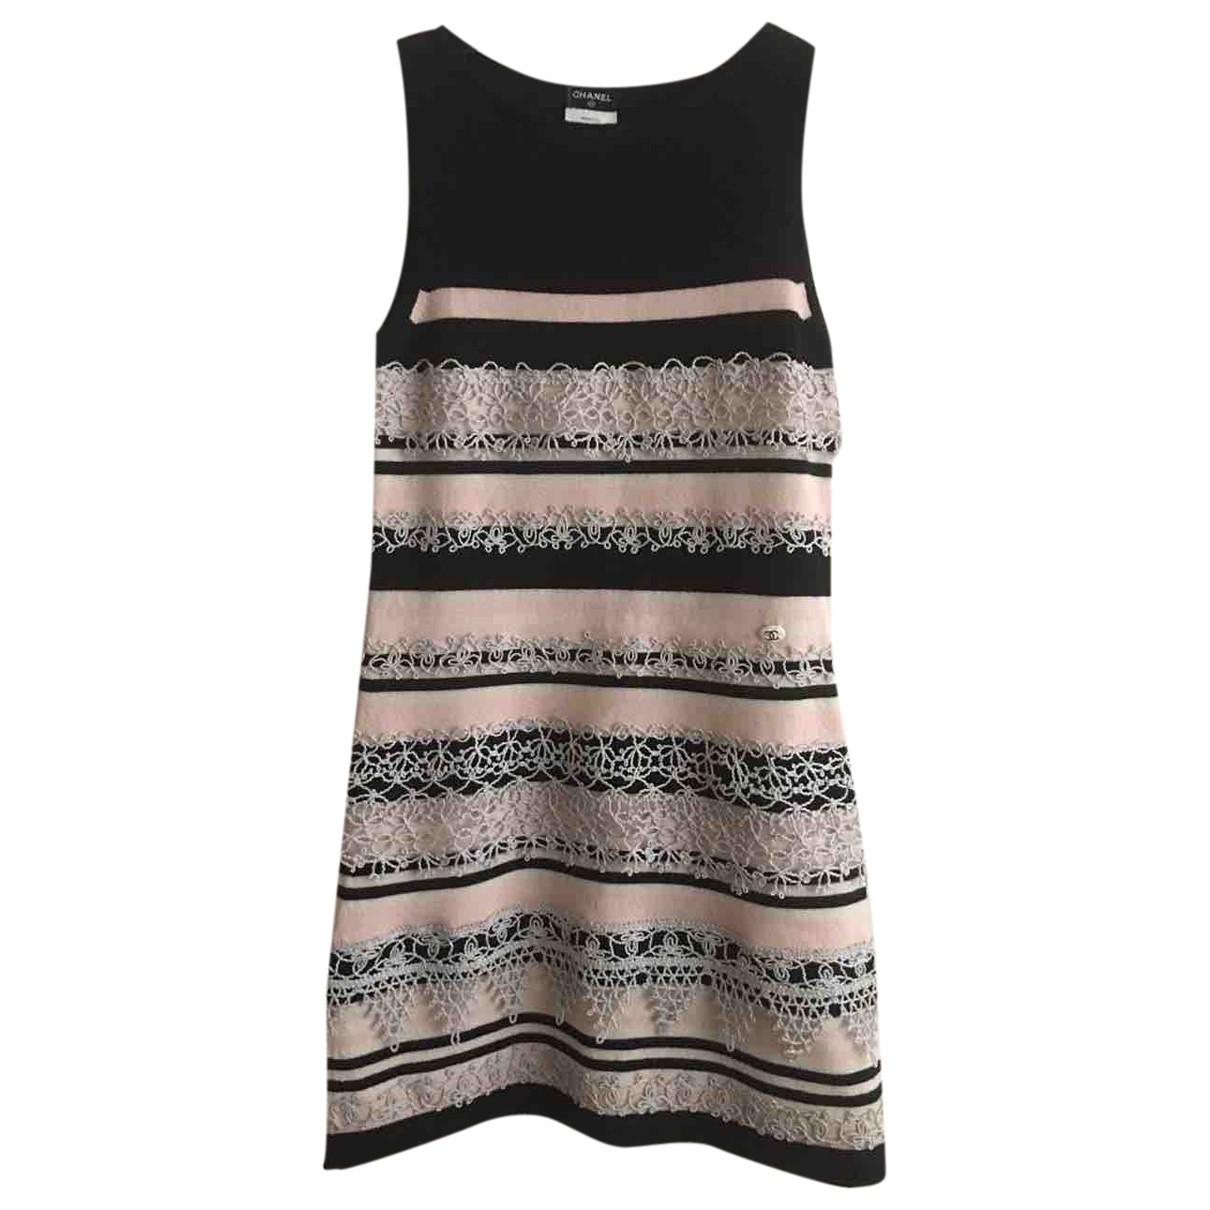 Chanel \N Kleid in  Bunt Kaschmir